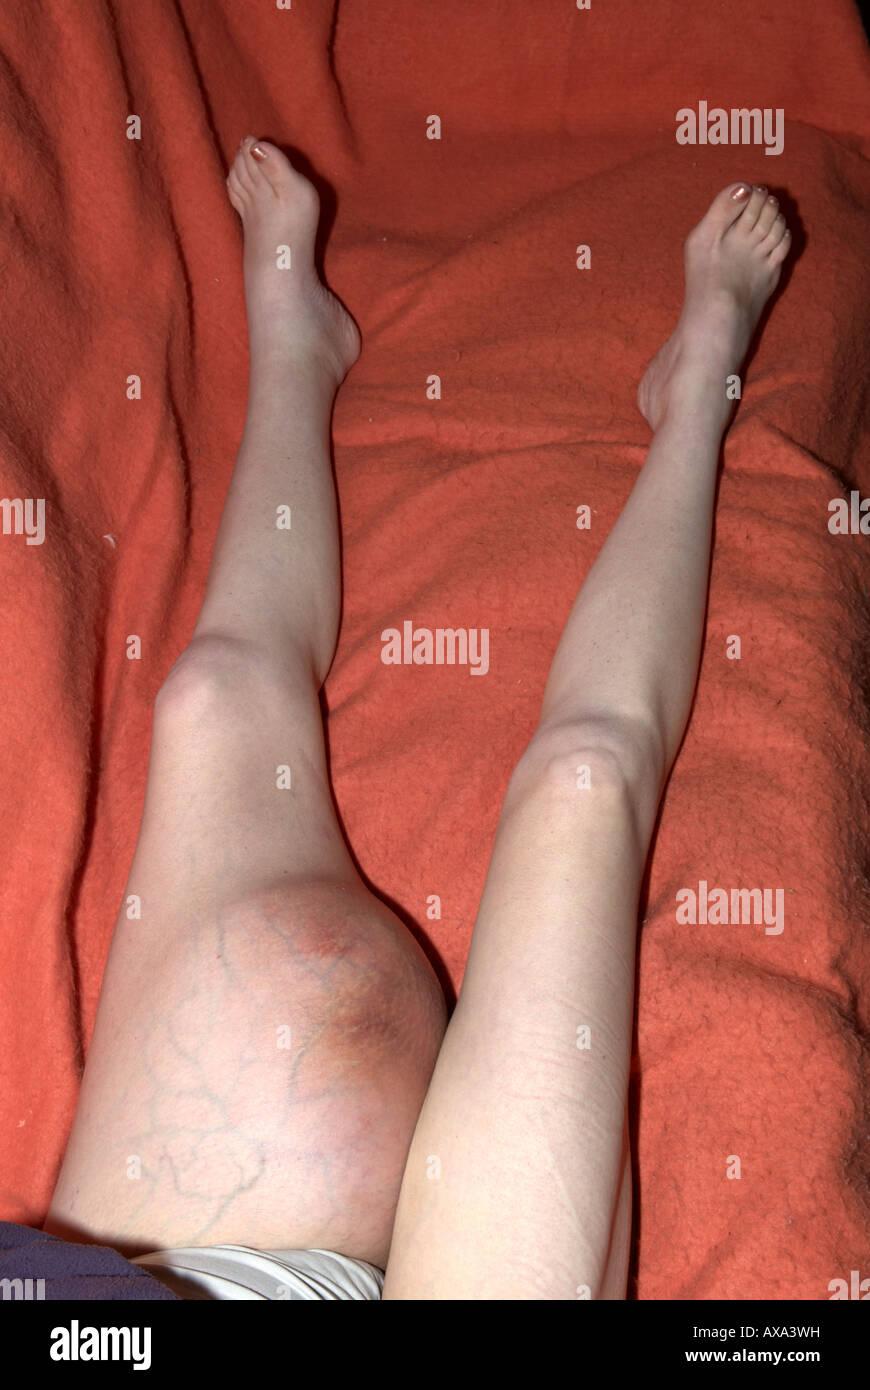 how to break up scar tissue in knee